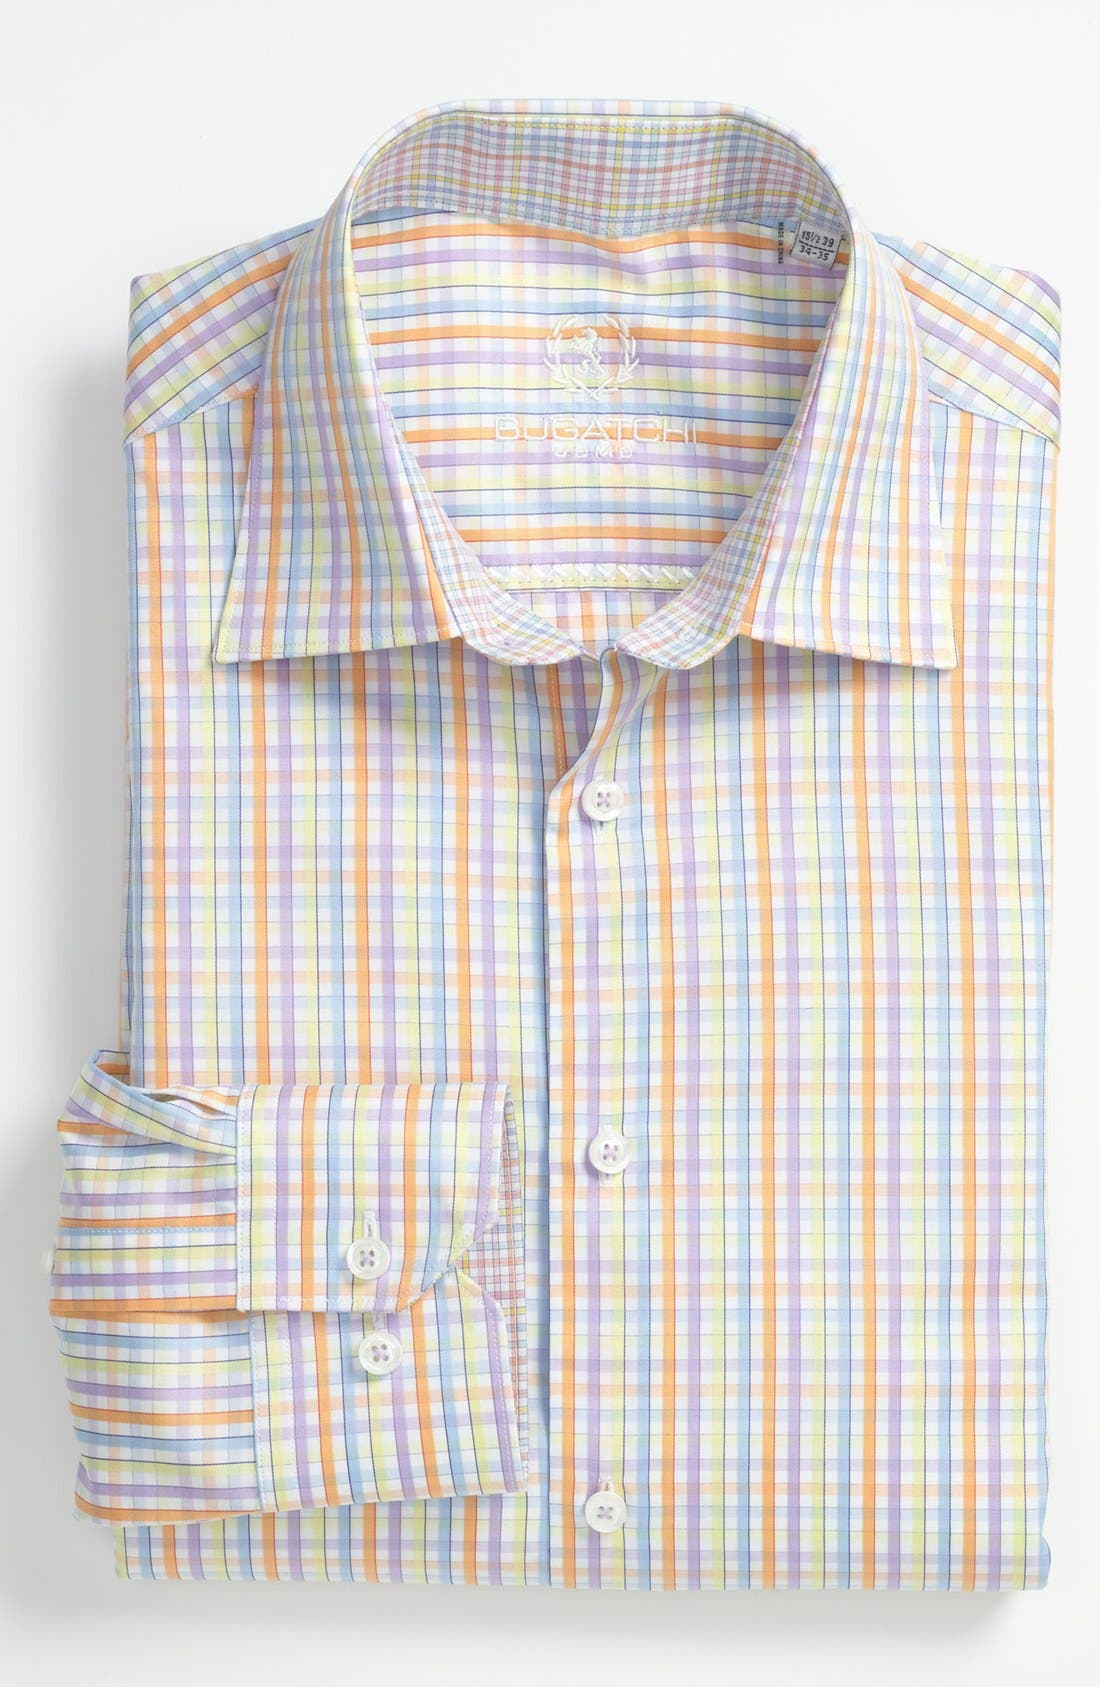 Main Image - Bugatchi Uomo Trim Fit Dress Shirt